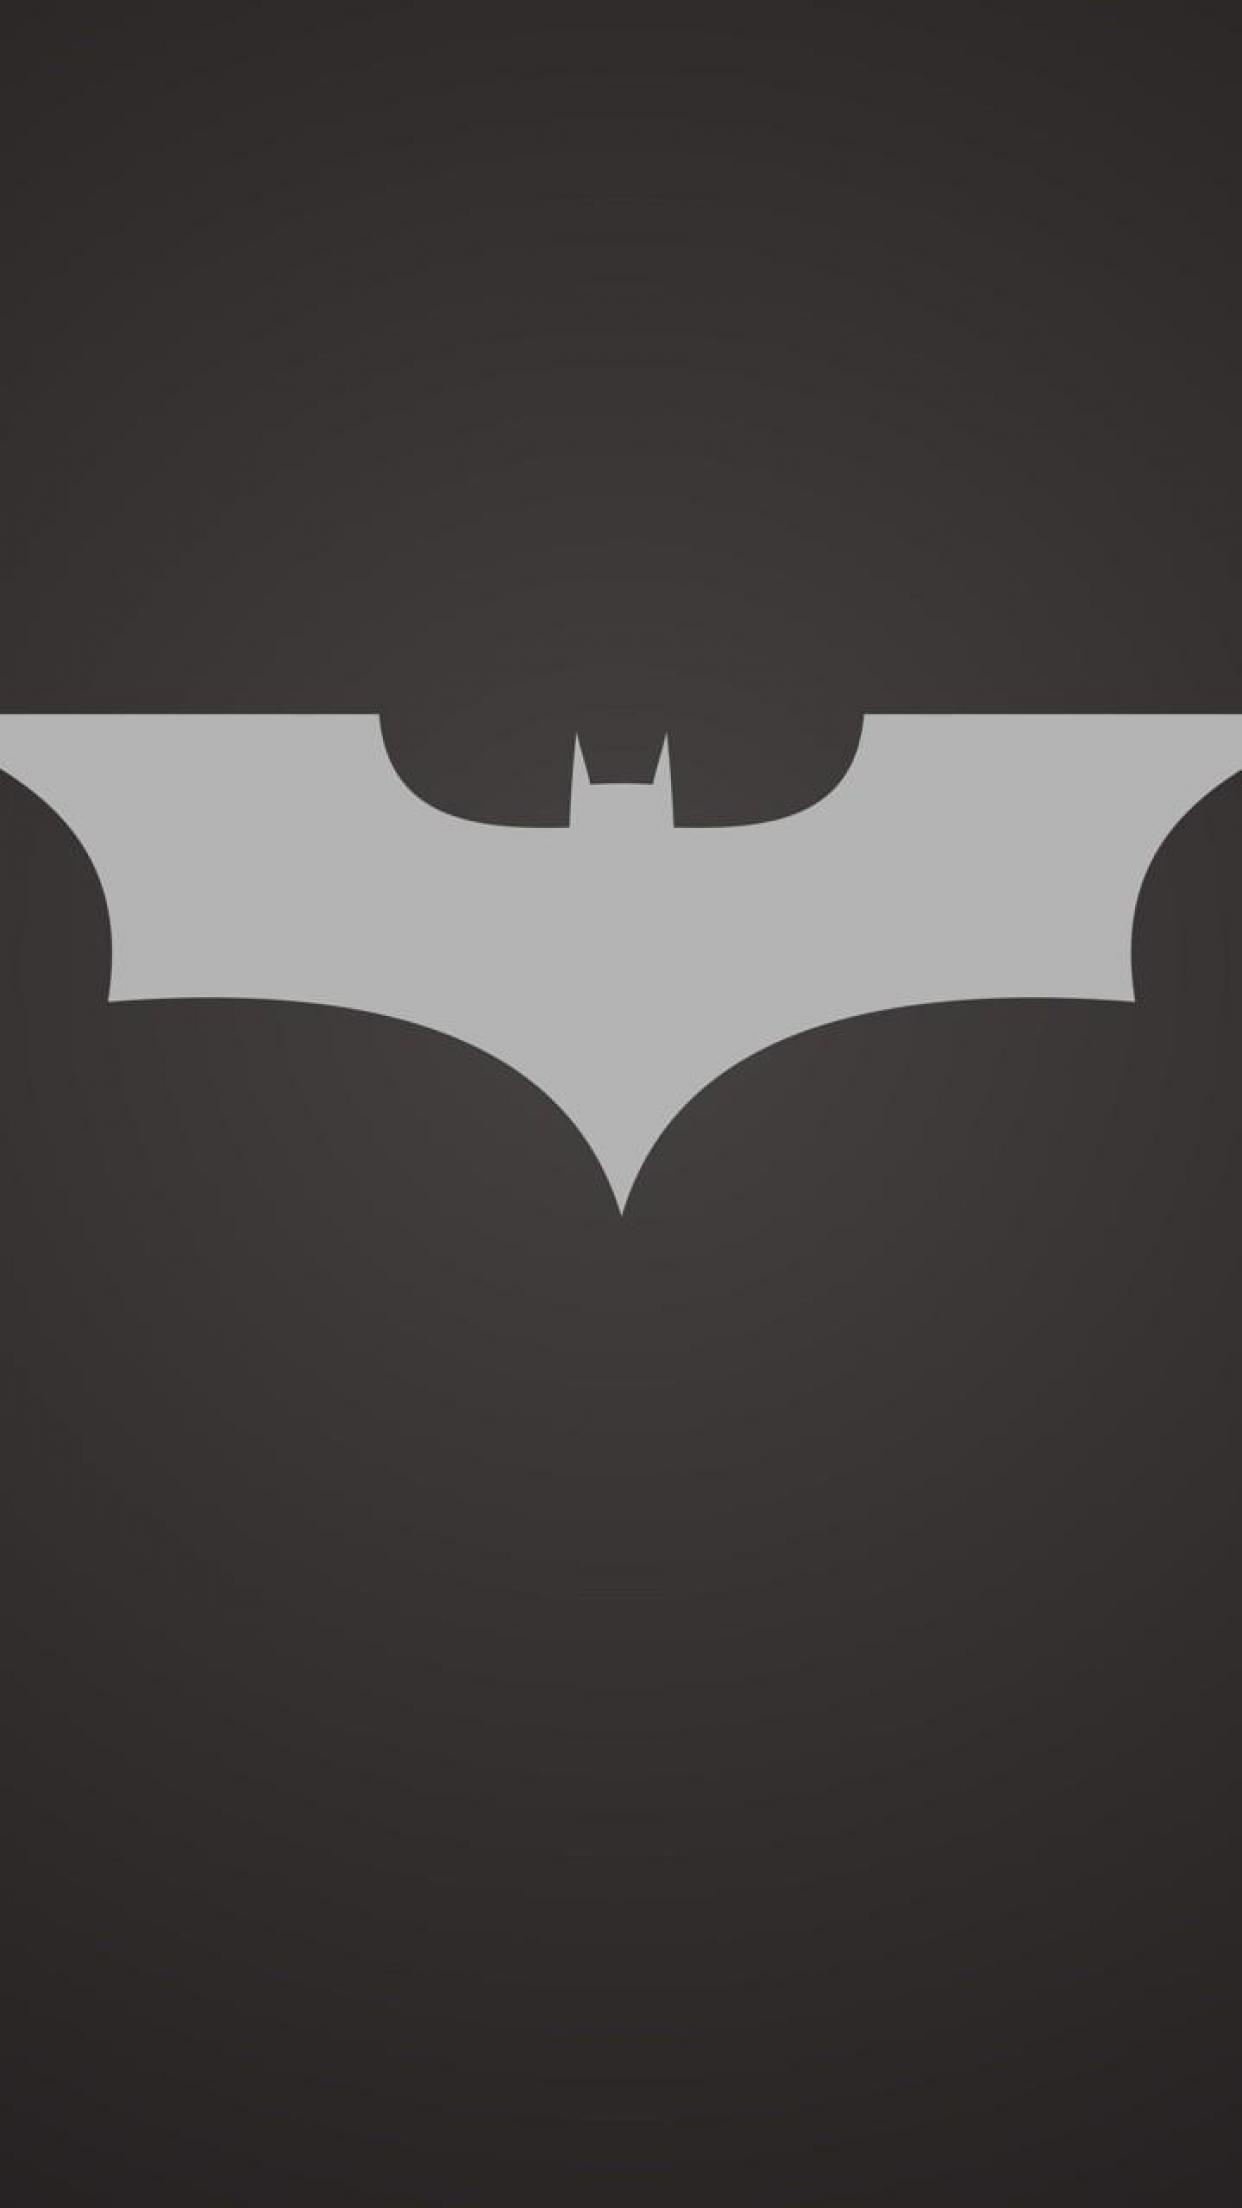 Batman-Logo-iPhone-Wallpapers-Free-Download